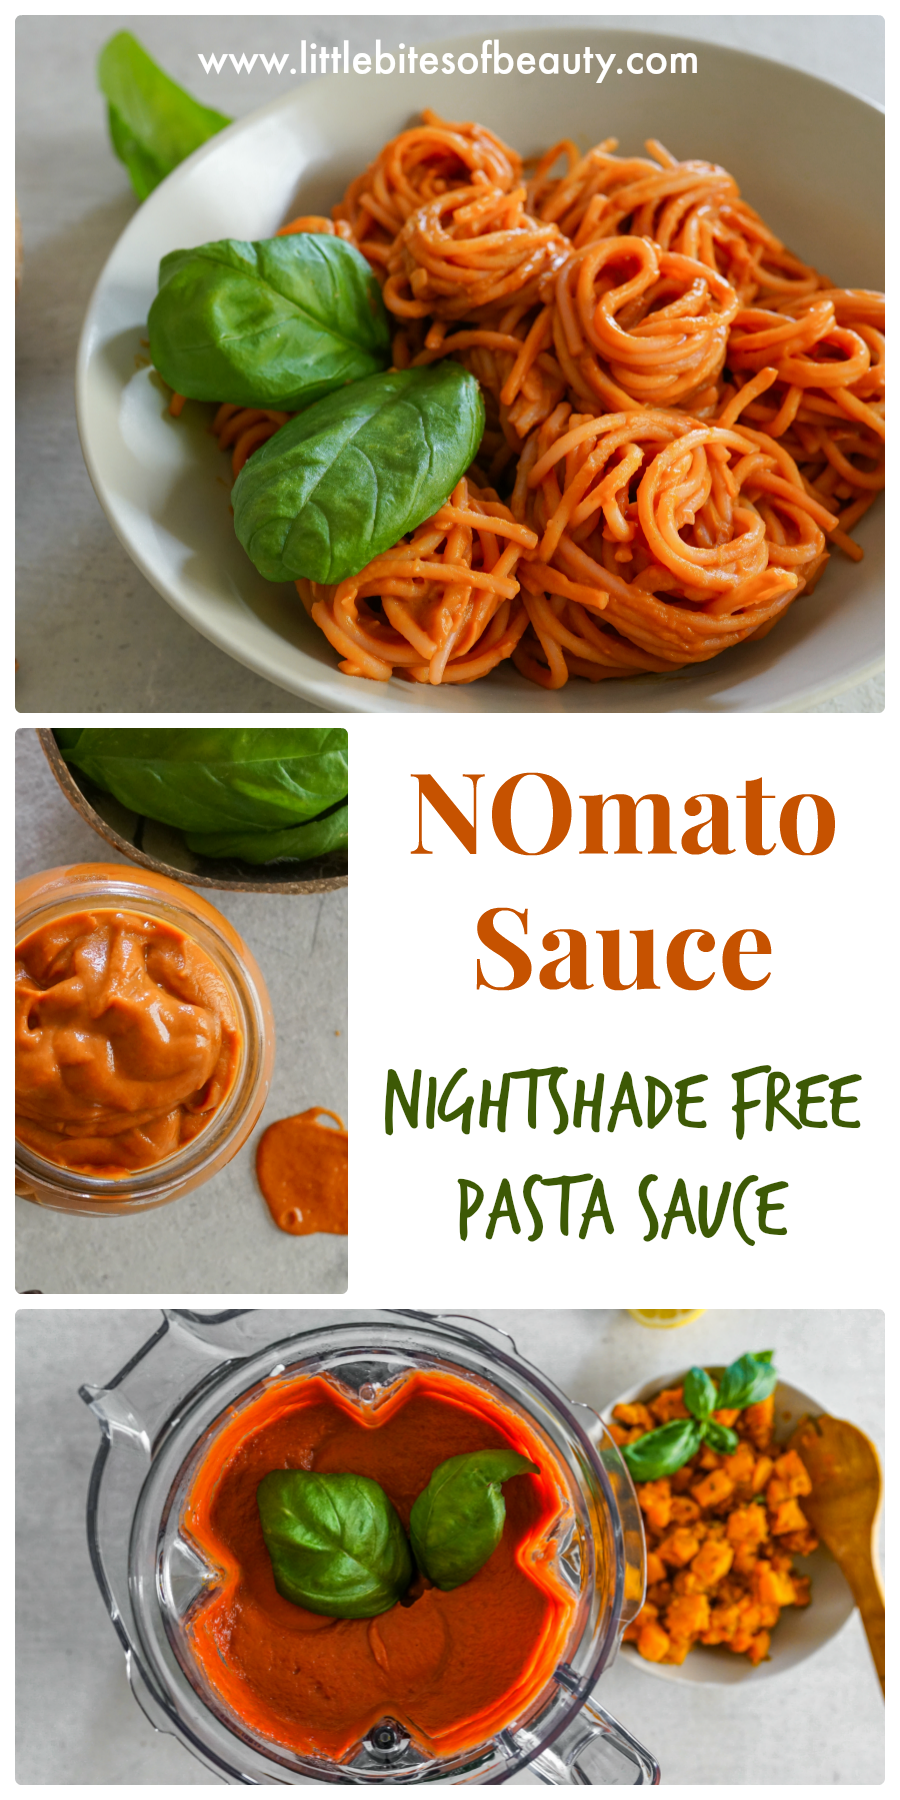 NOmato Sauce (Nightshade Free Pasta Sauce)